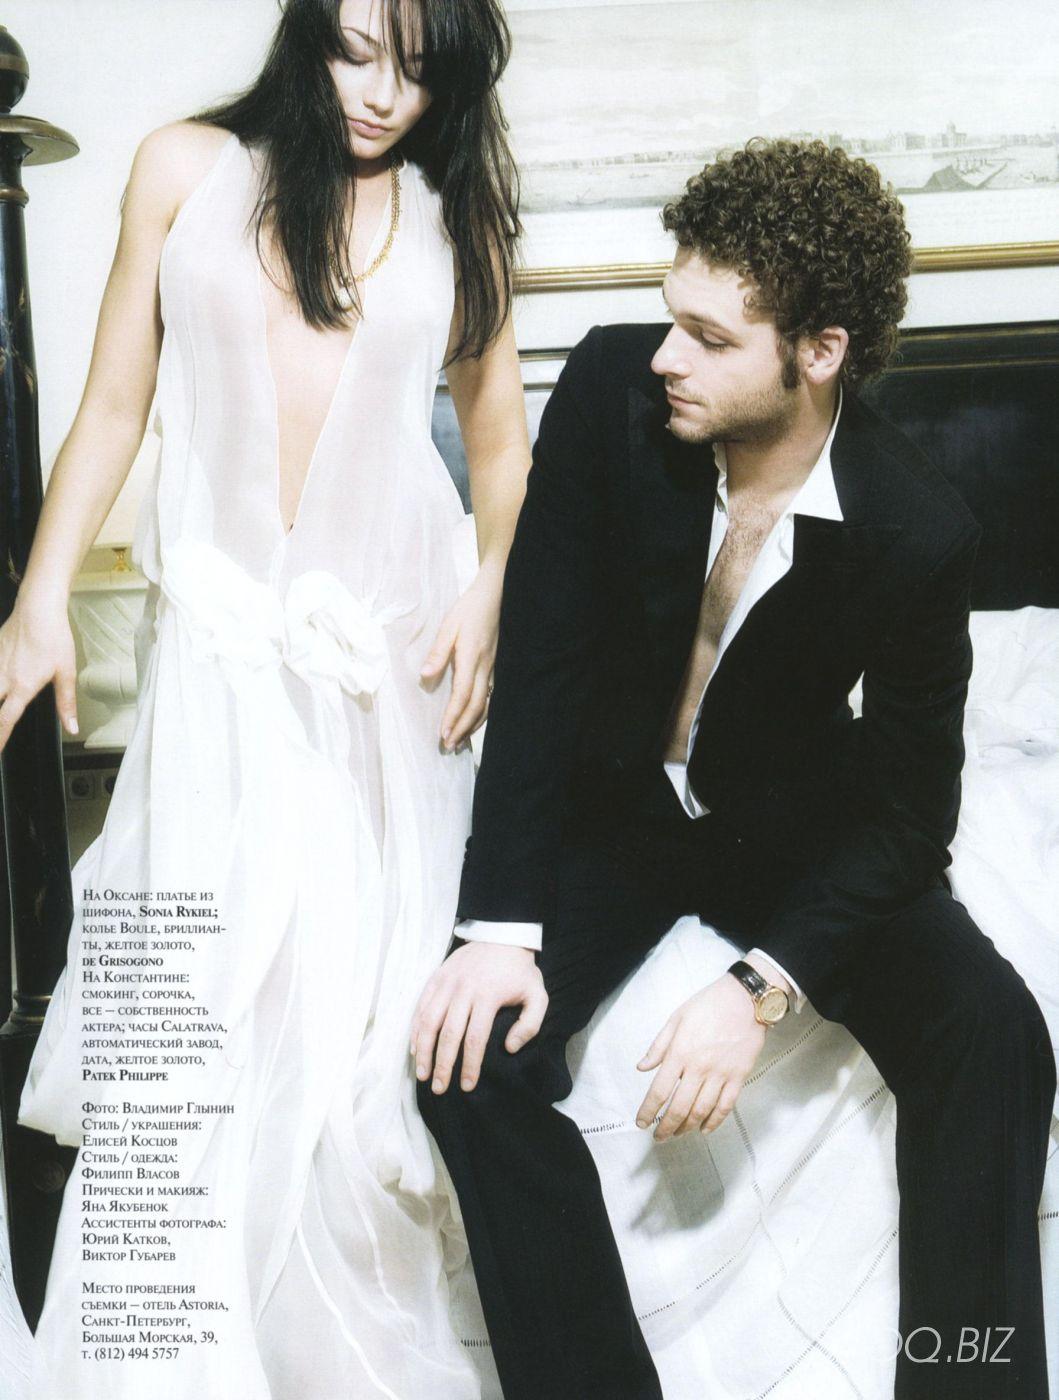 Оксана Акиньшина голая фотосессия в журнале GQ 2003